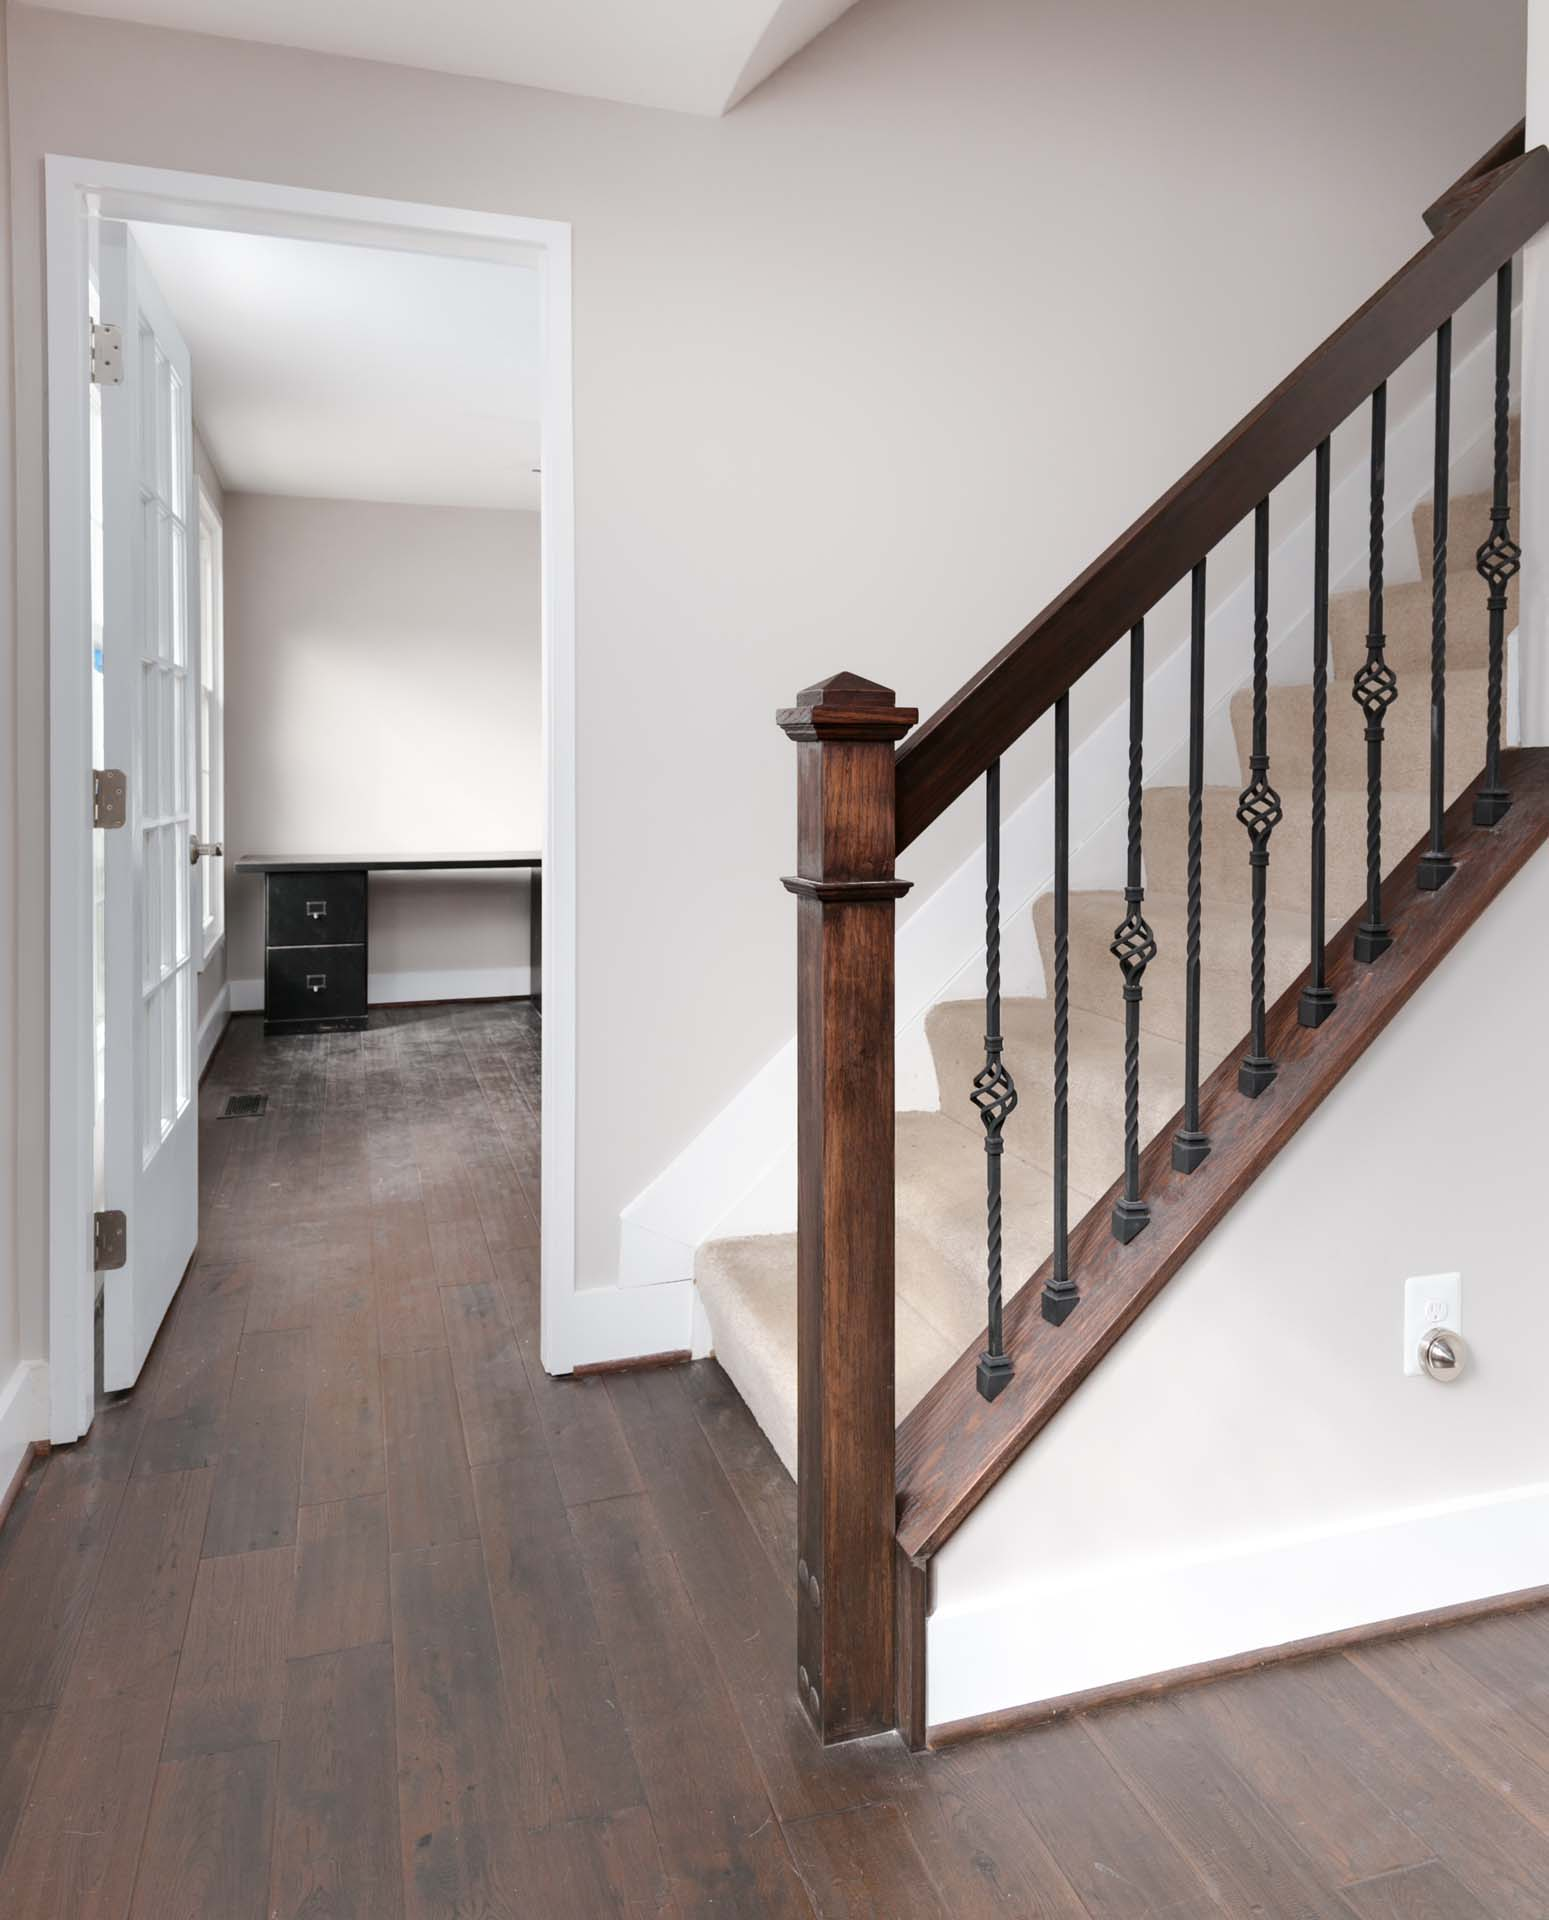 012 Stair